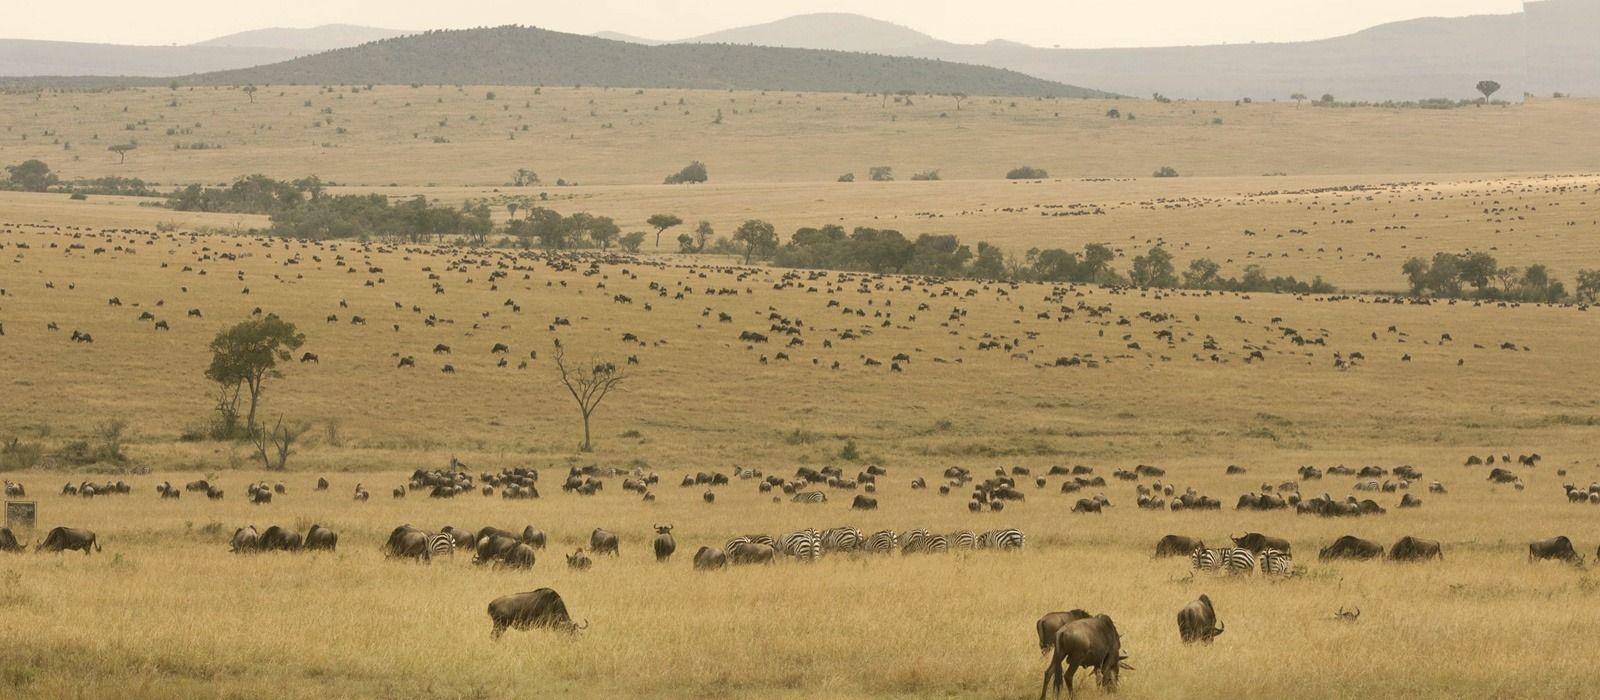 Kenia Reisen & Rundreisen